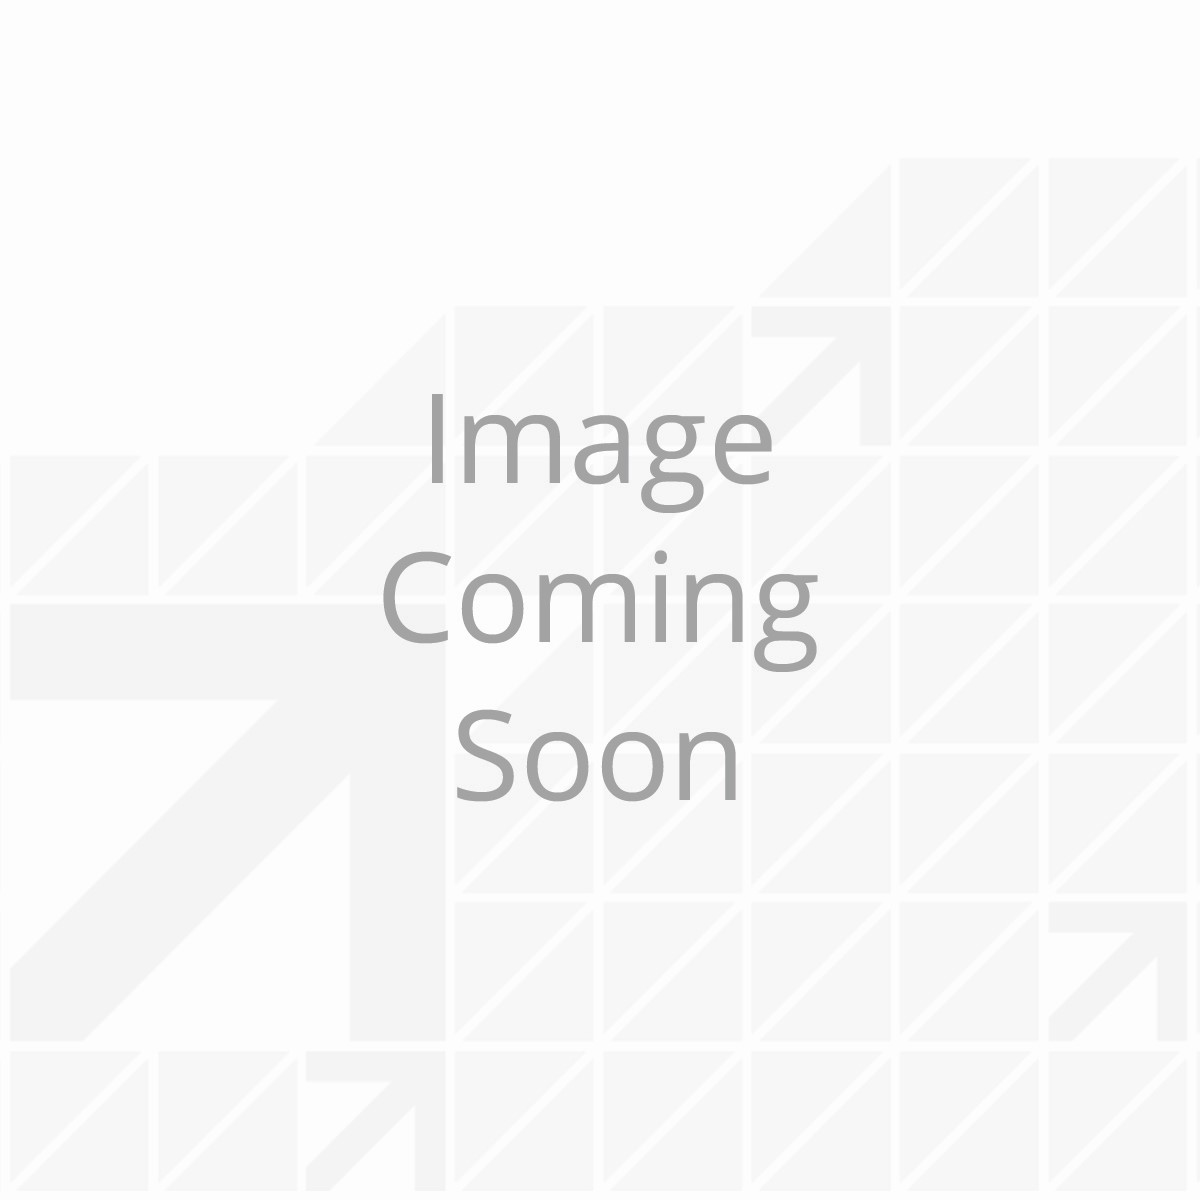 243621_Slotted-Storage-Rack_001